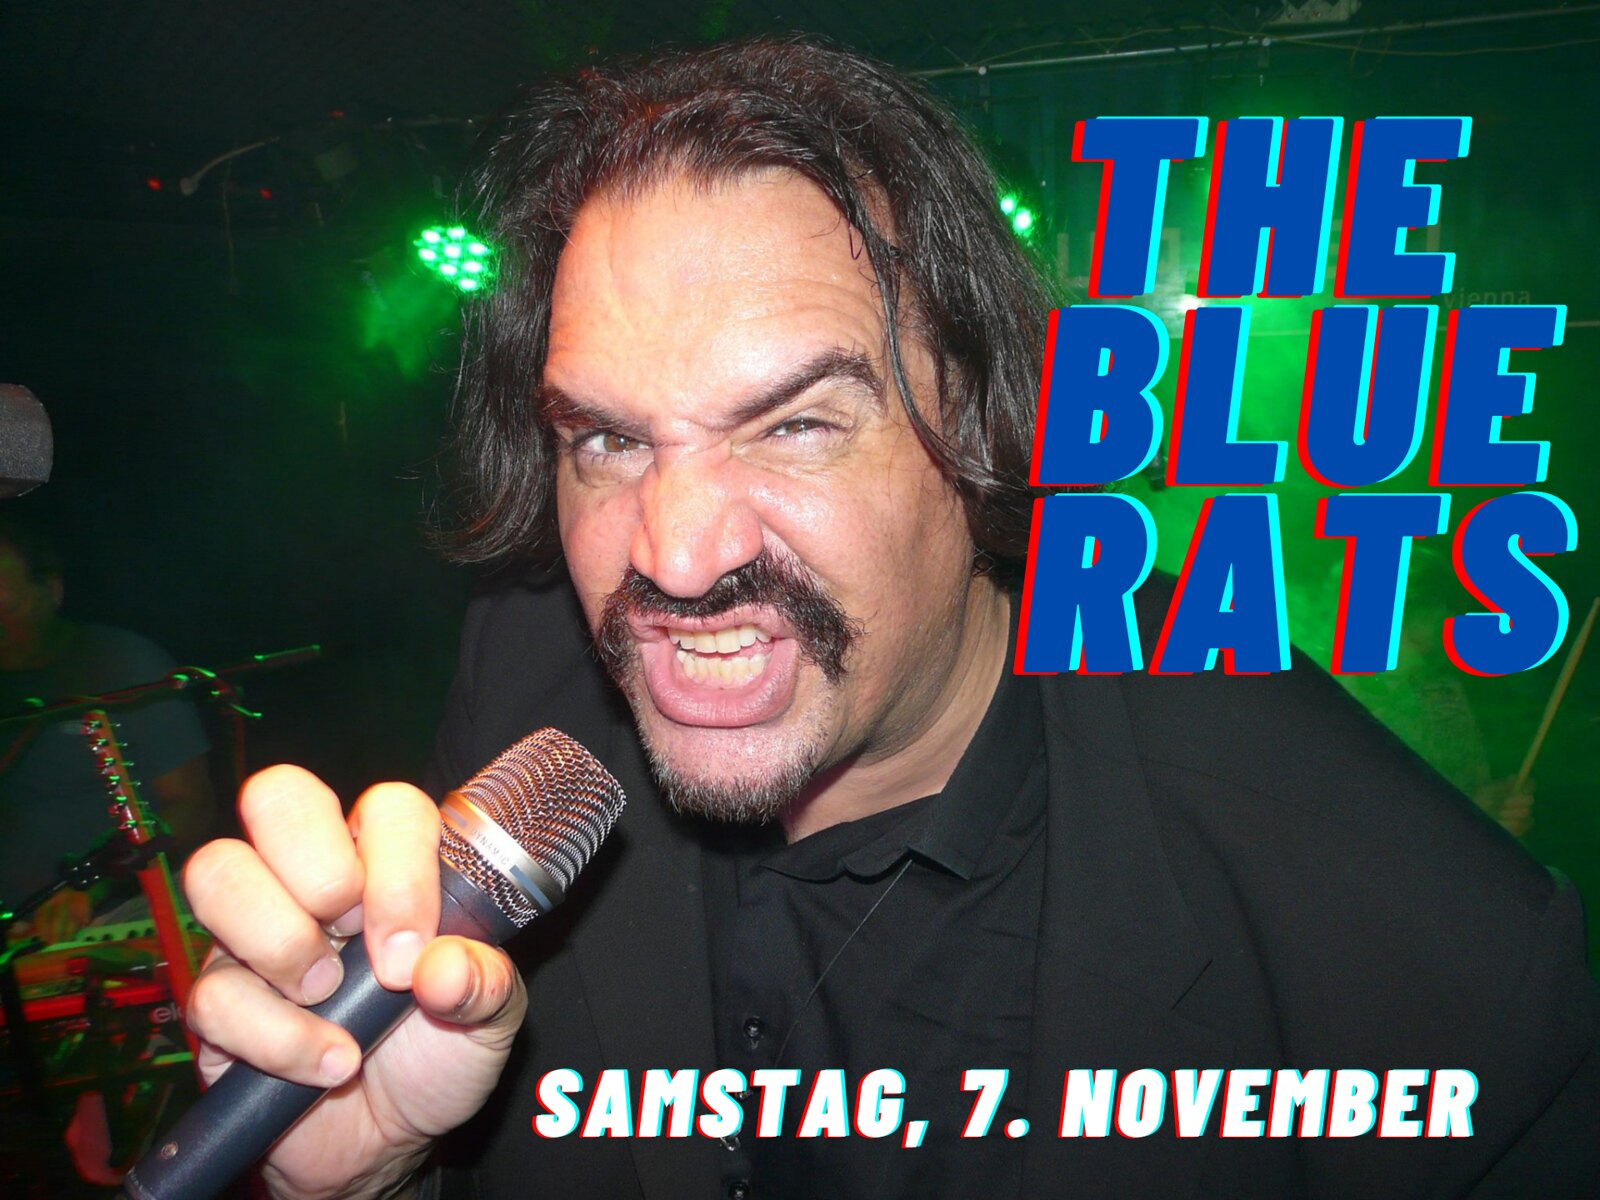 The Blue Rats